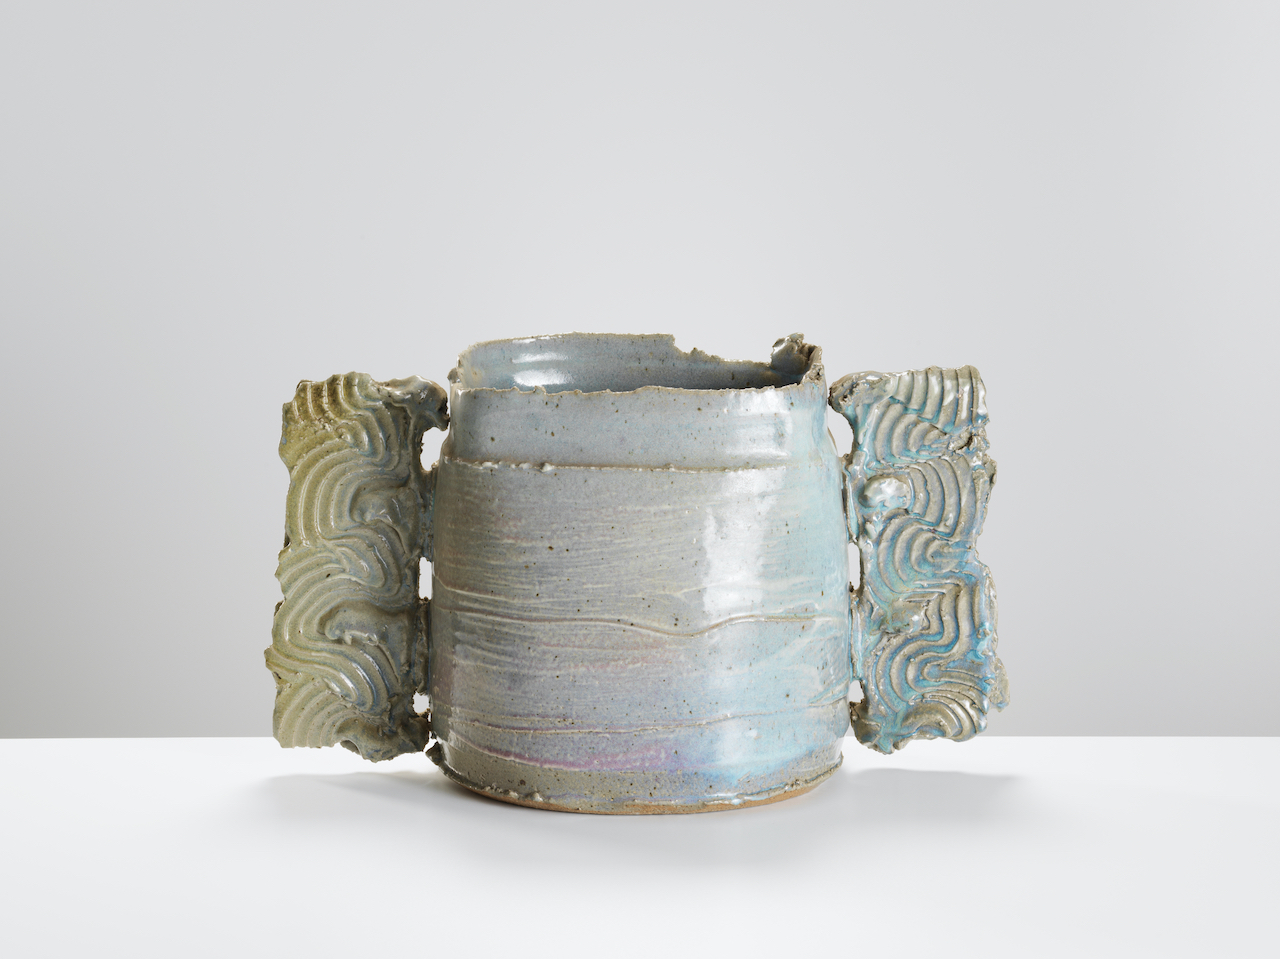 Colin Pearson, Large Winged Pot, c1980s. Courtesy of Oxford Ceramics.